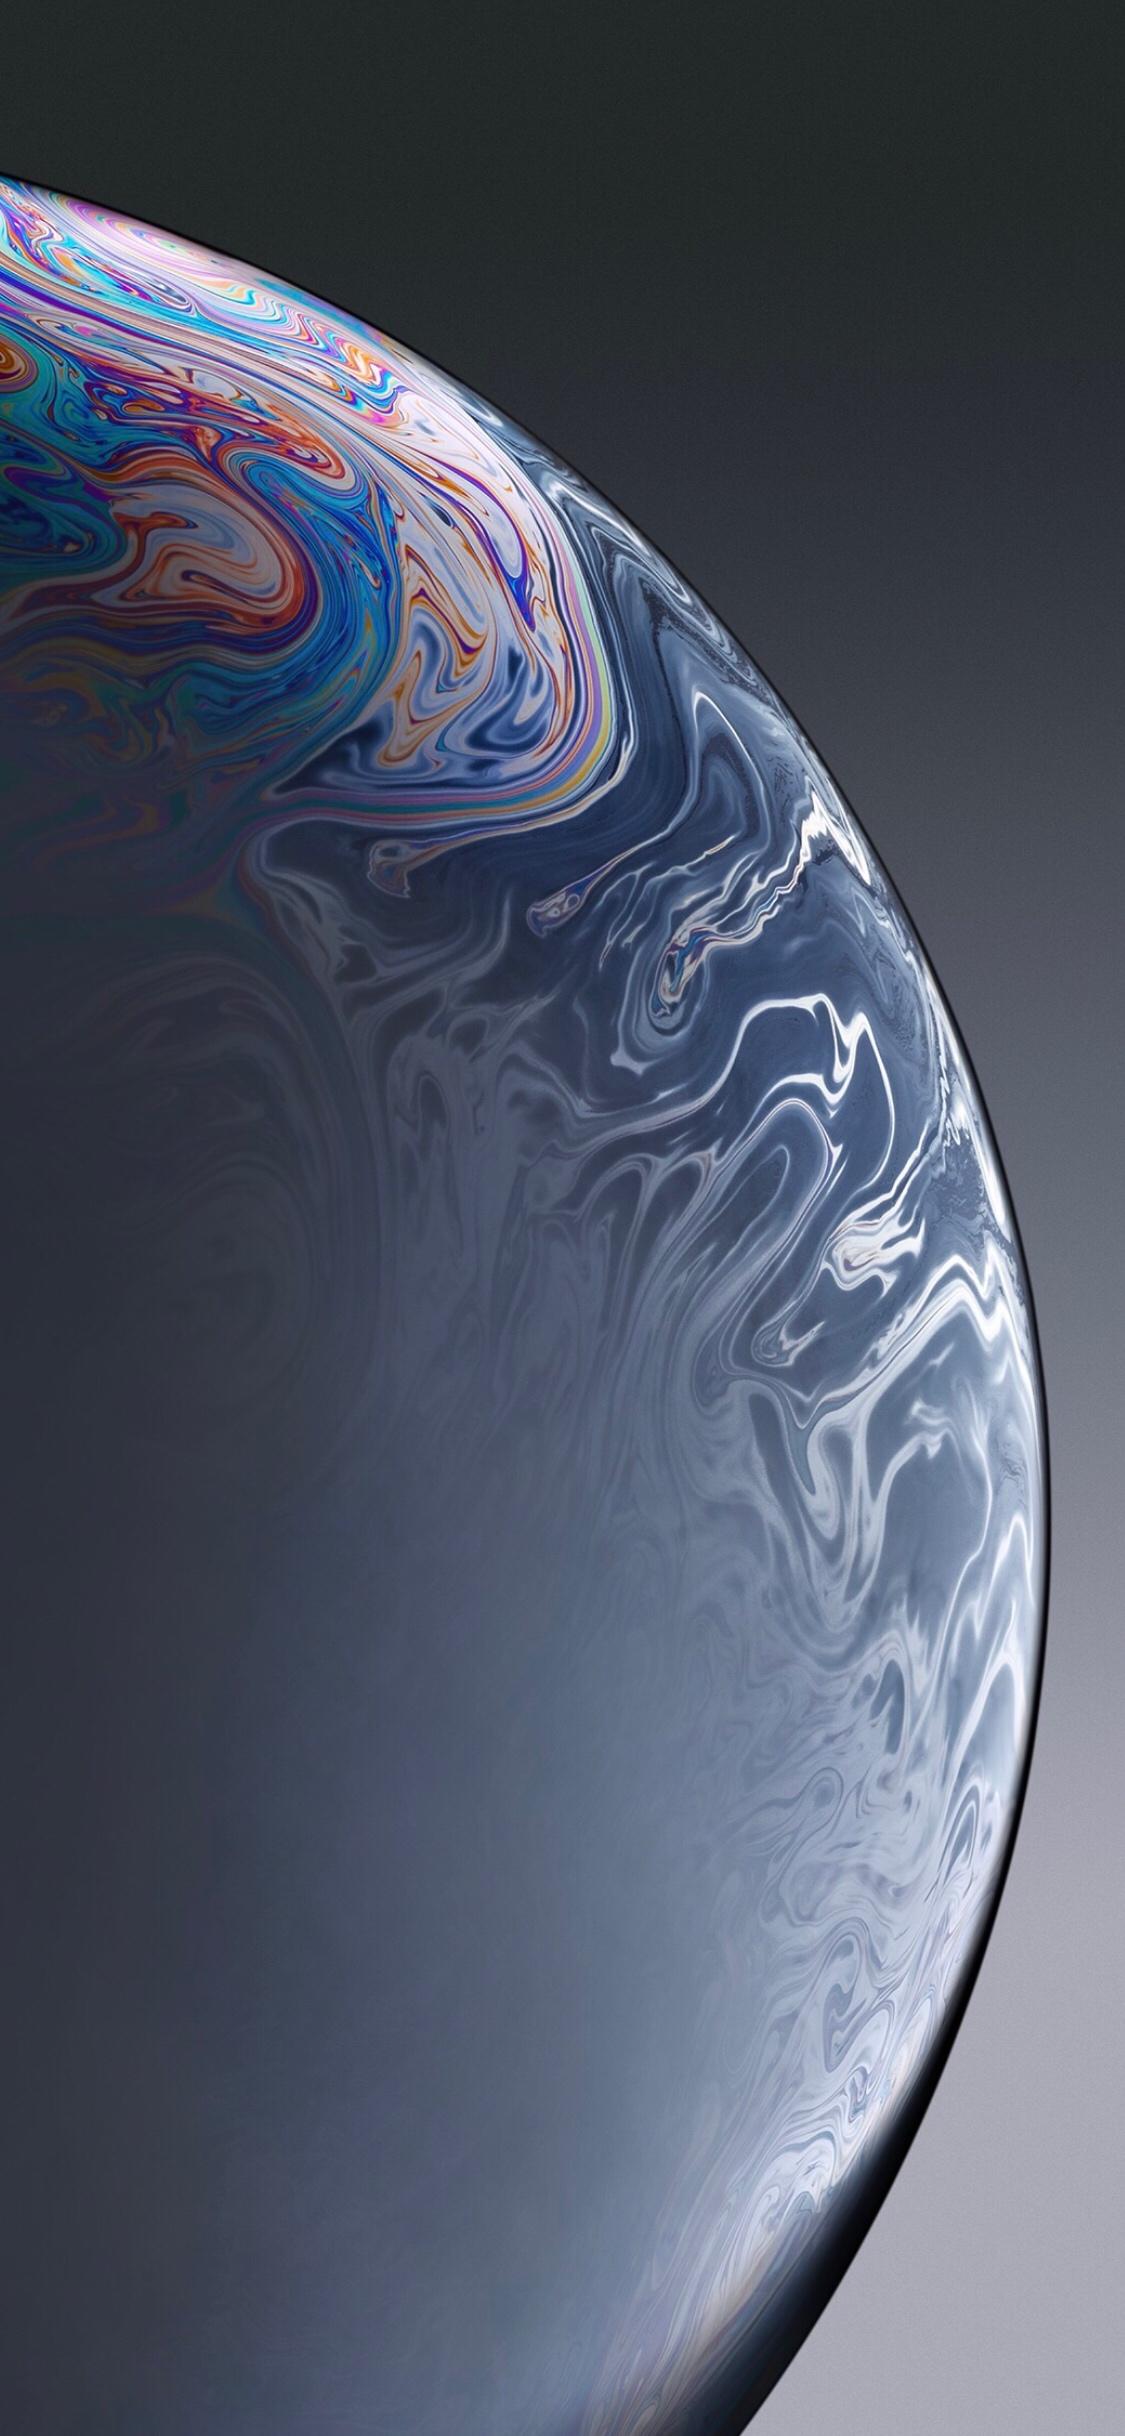 iPhone XR Black Bubble Wallpaper